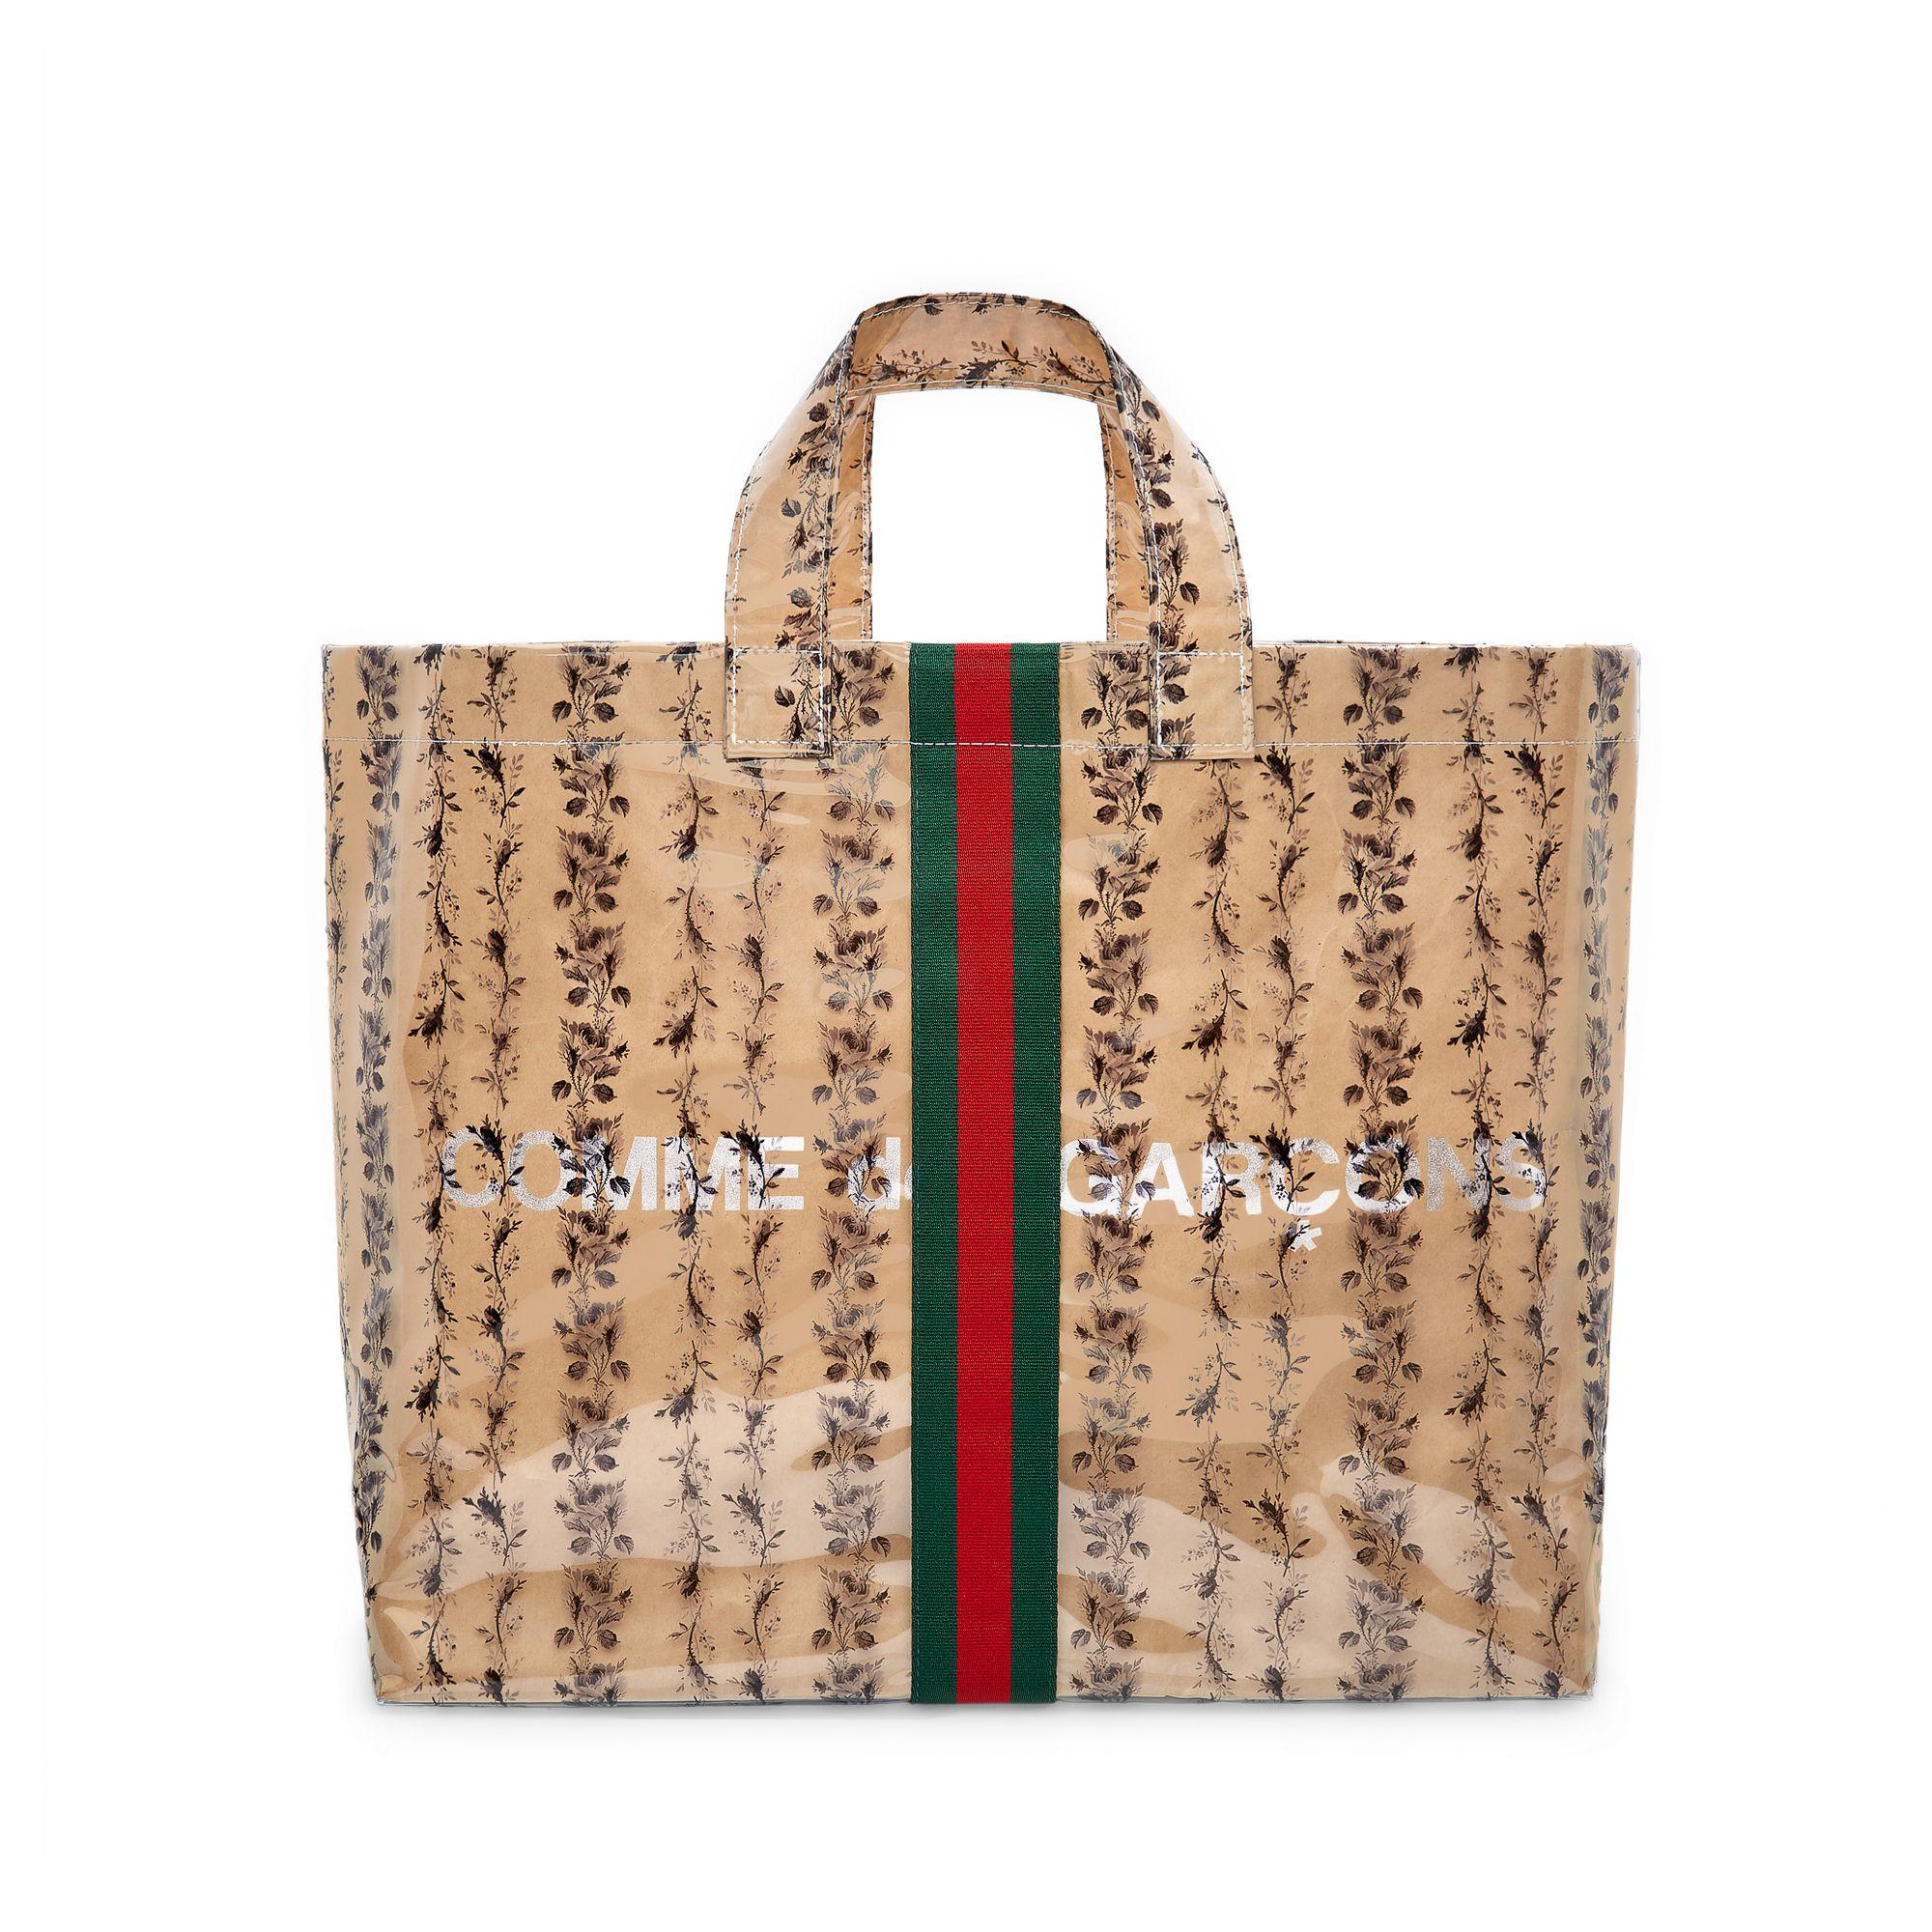 MH Obsession: Comme des Garçons X Gucci Tote Bag